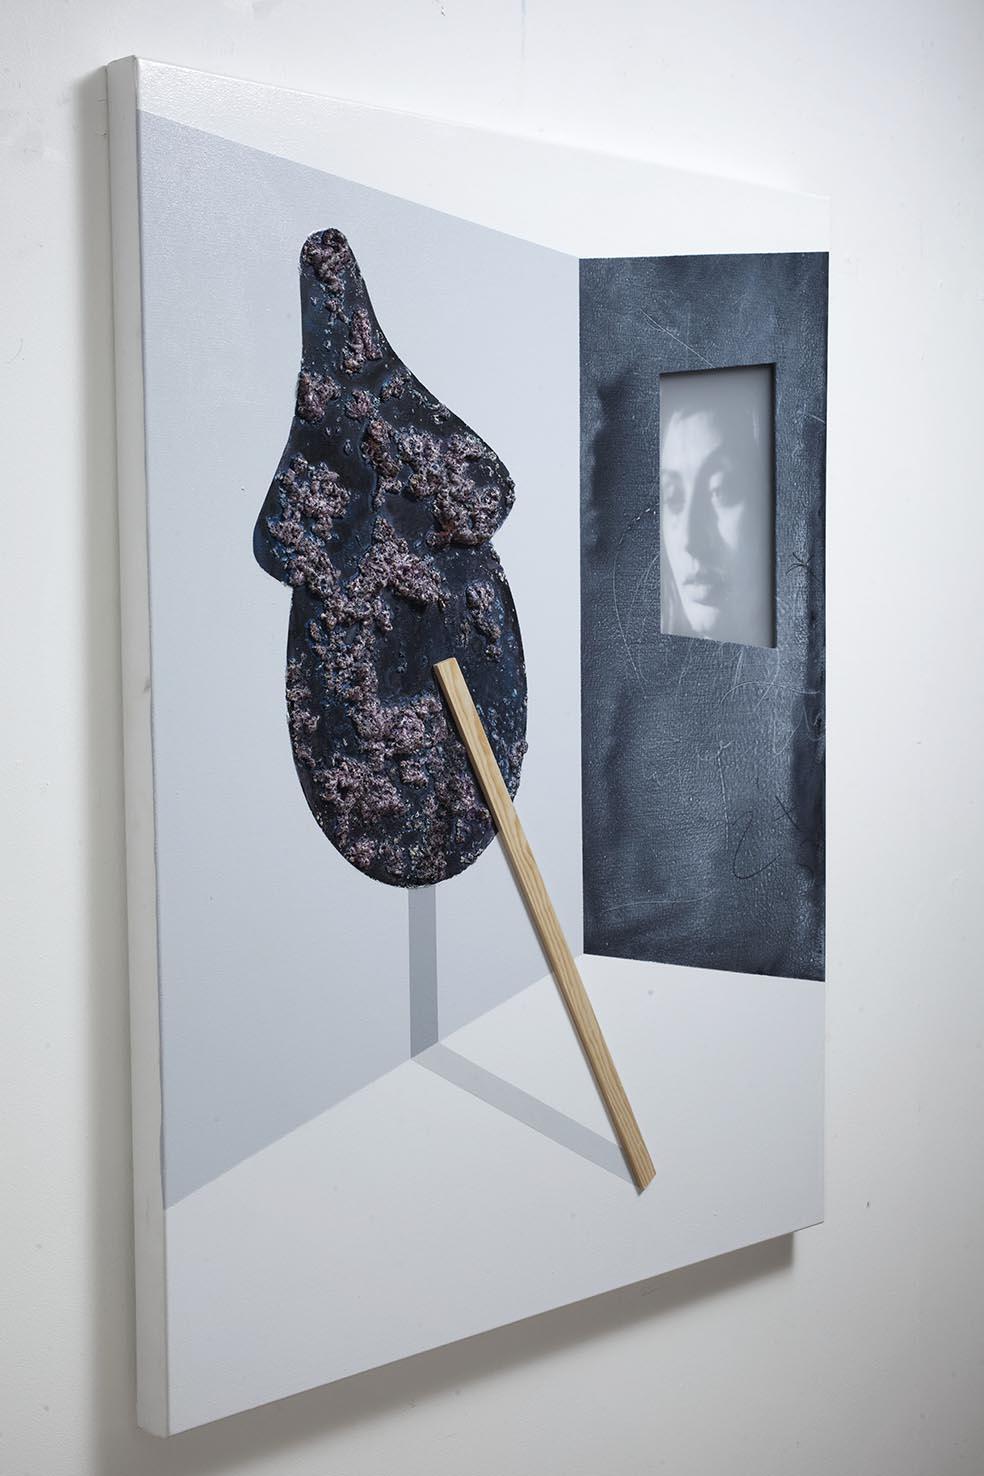 Pinocchio and Sofia / 2017 / Acrylic paint, wooden strip, plexiglass and polyurethane foam on canvas / 100,80 cm - STAGE  - Pere Galera